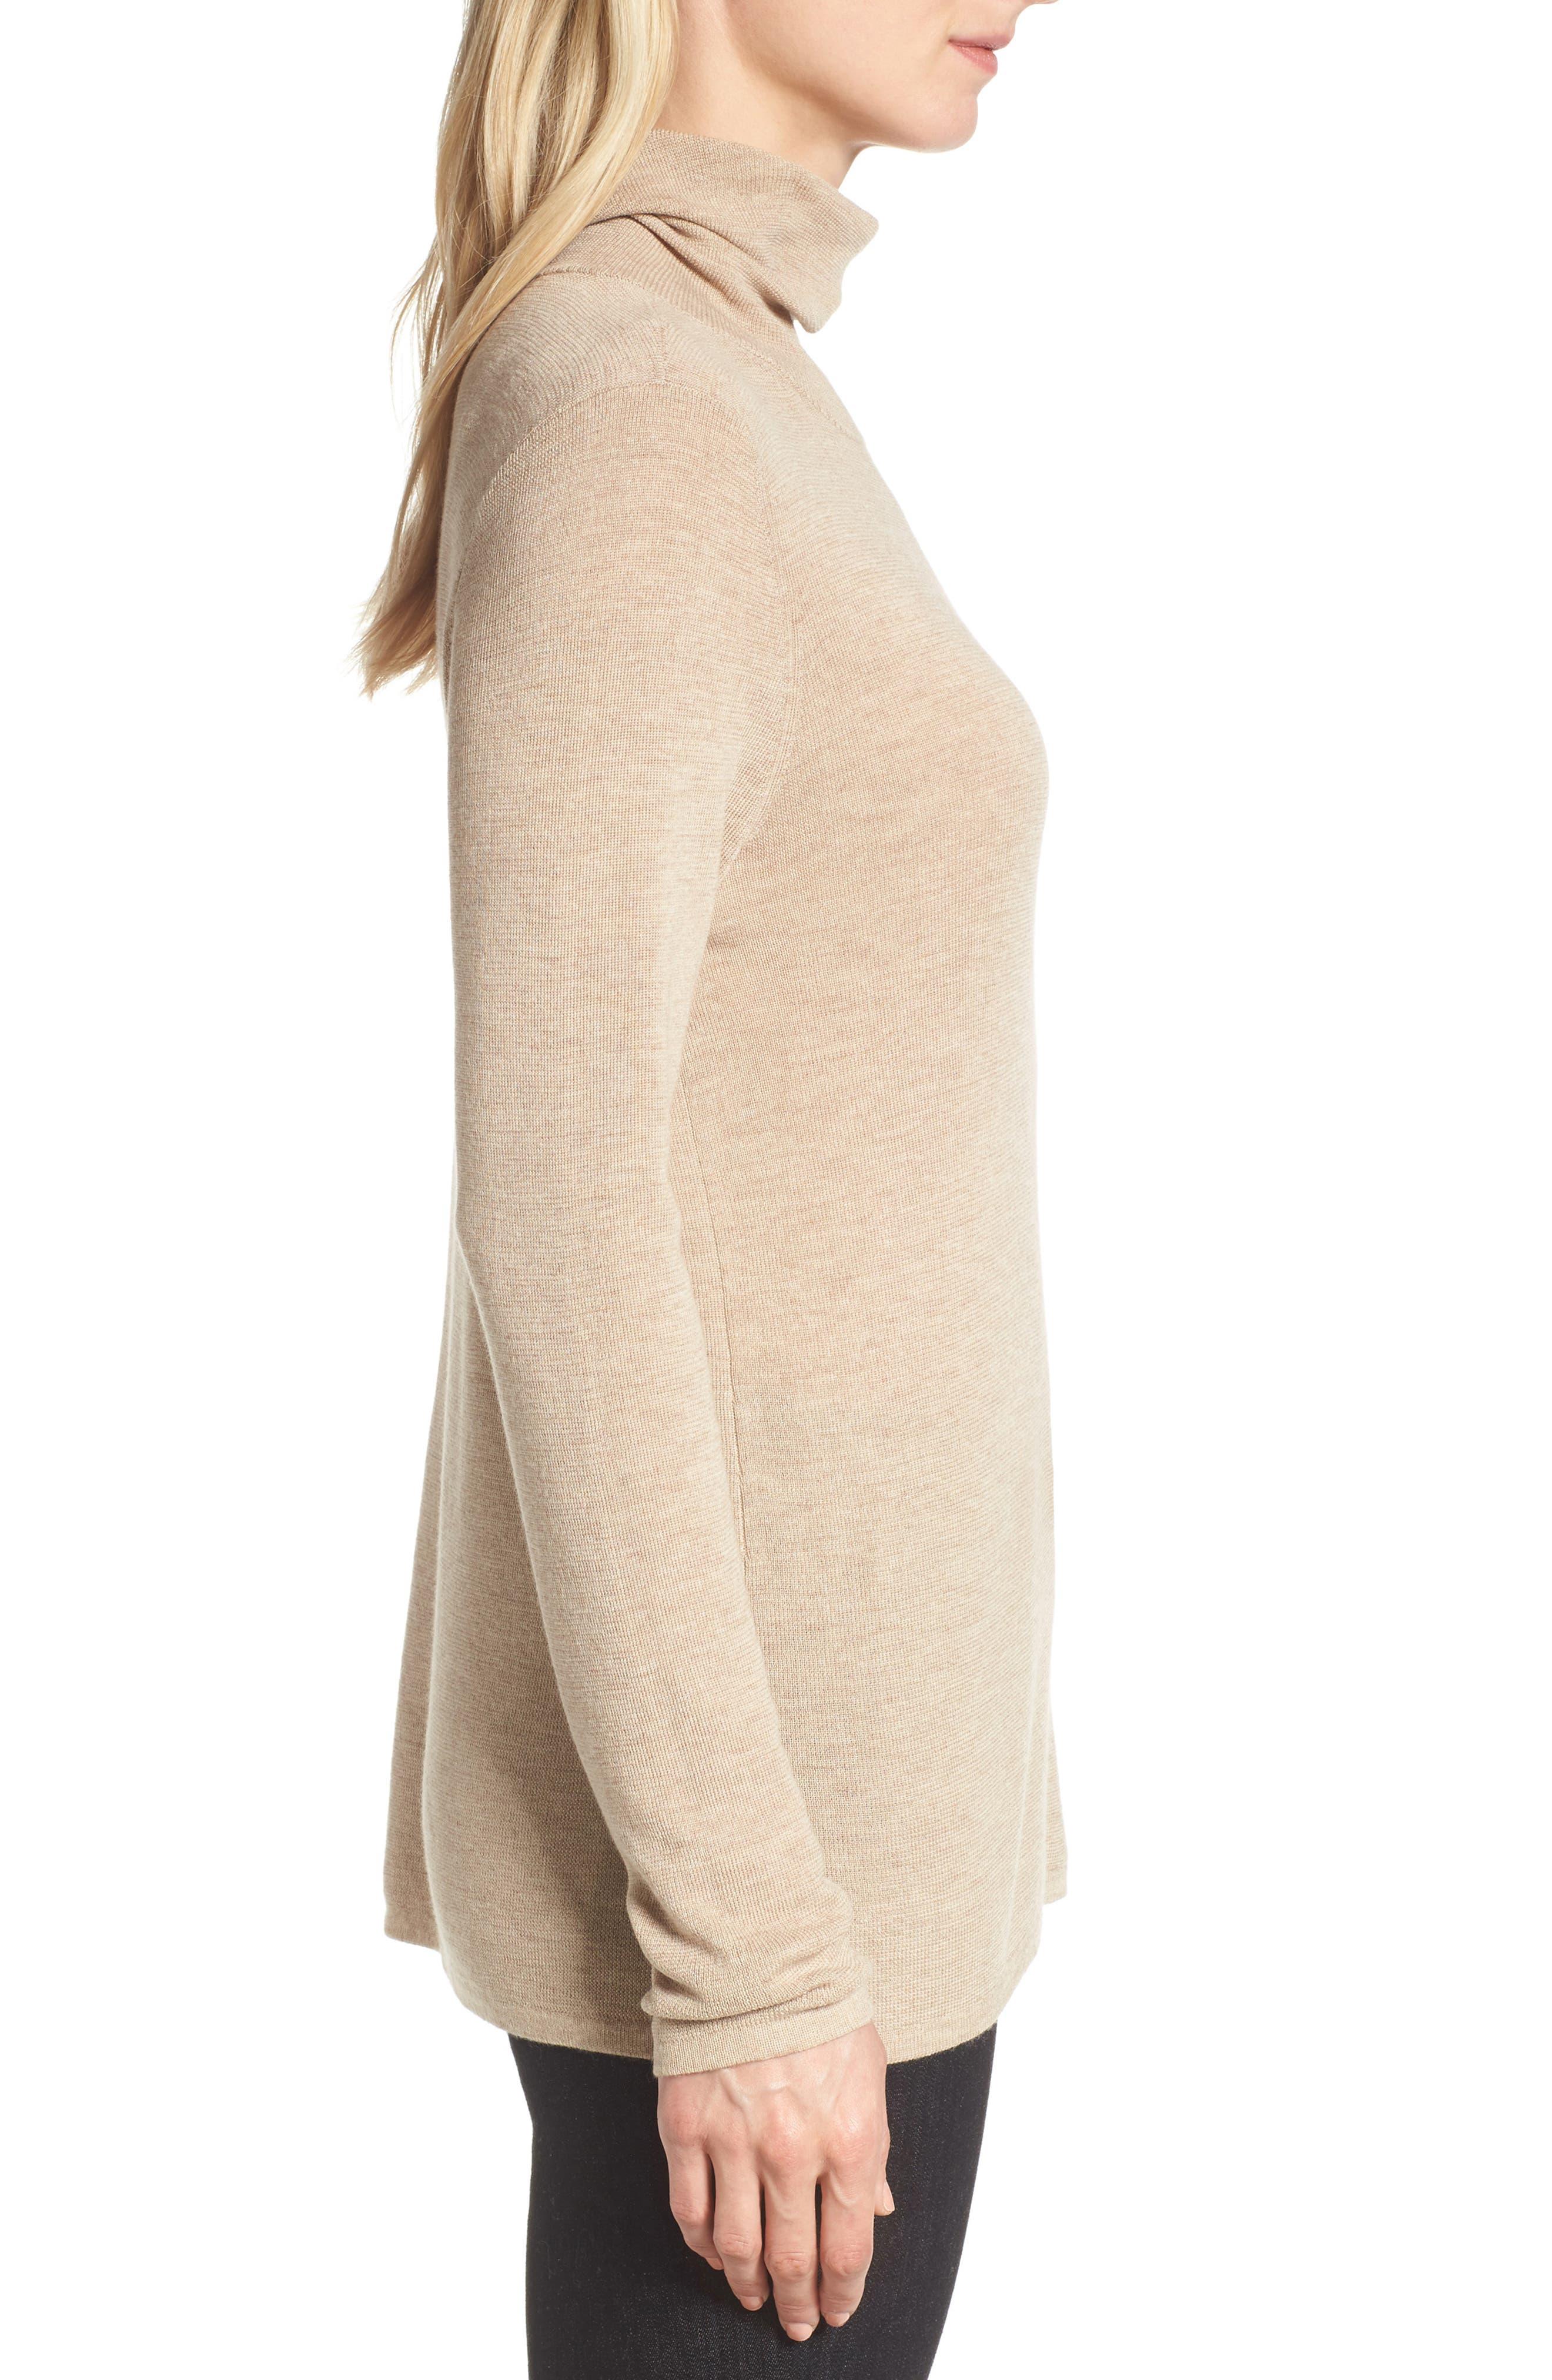 The Fisher Project Ultrafine Merino Turtleneck Sweater,                             Alternate thumbnail 3, color,                             Maple Oat